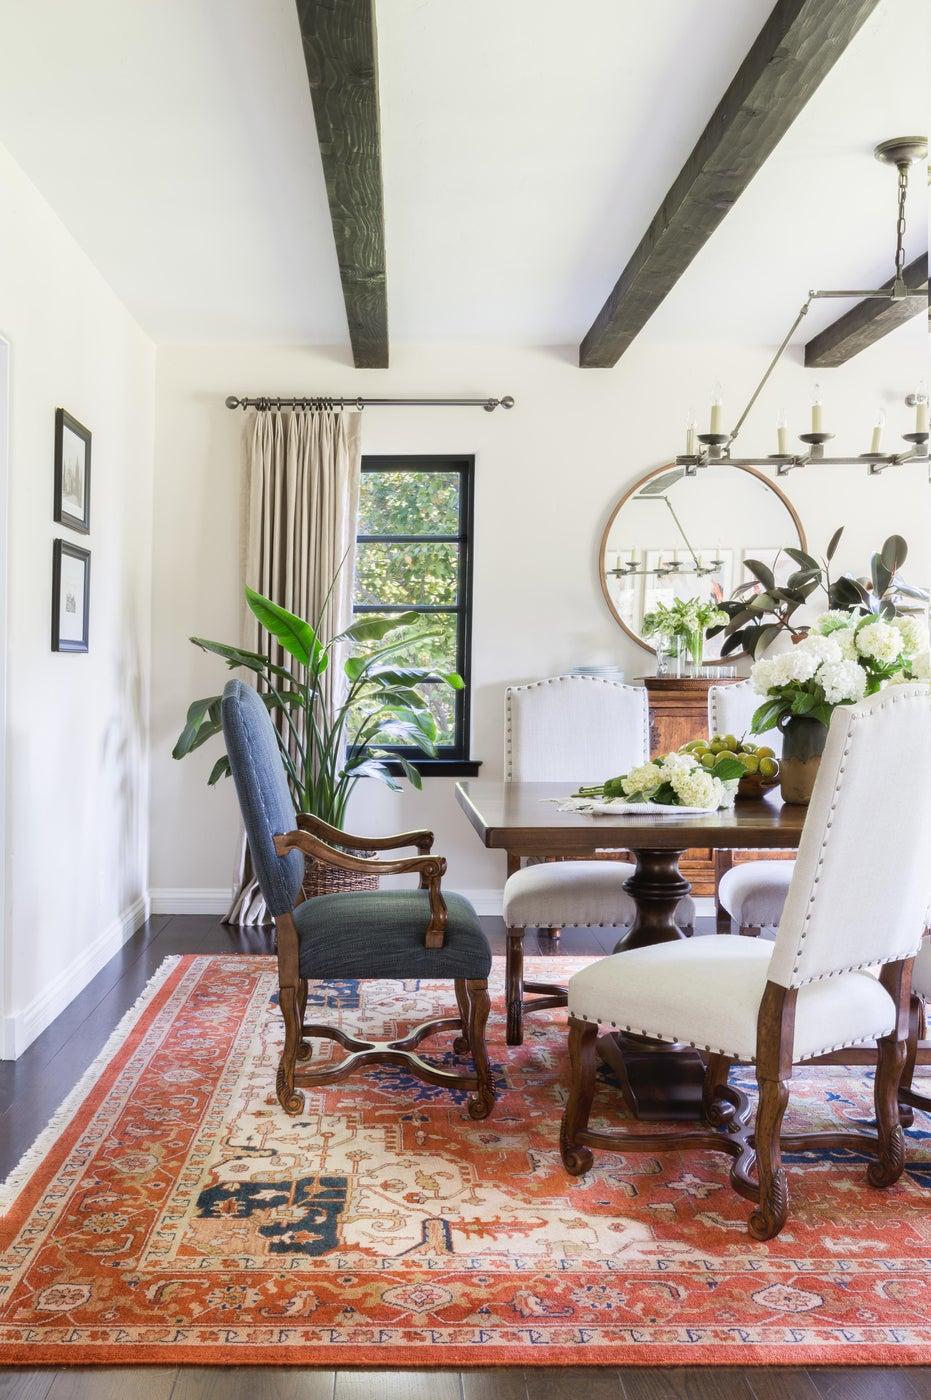 Transitional California Spanish Revival Dining Room